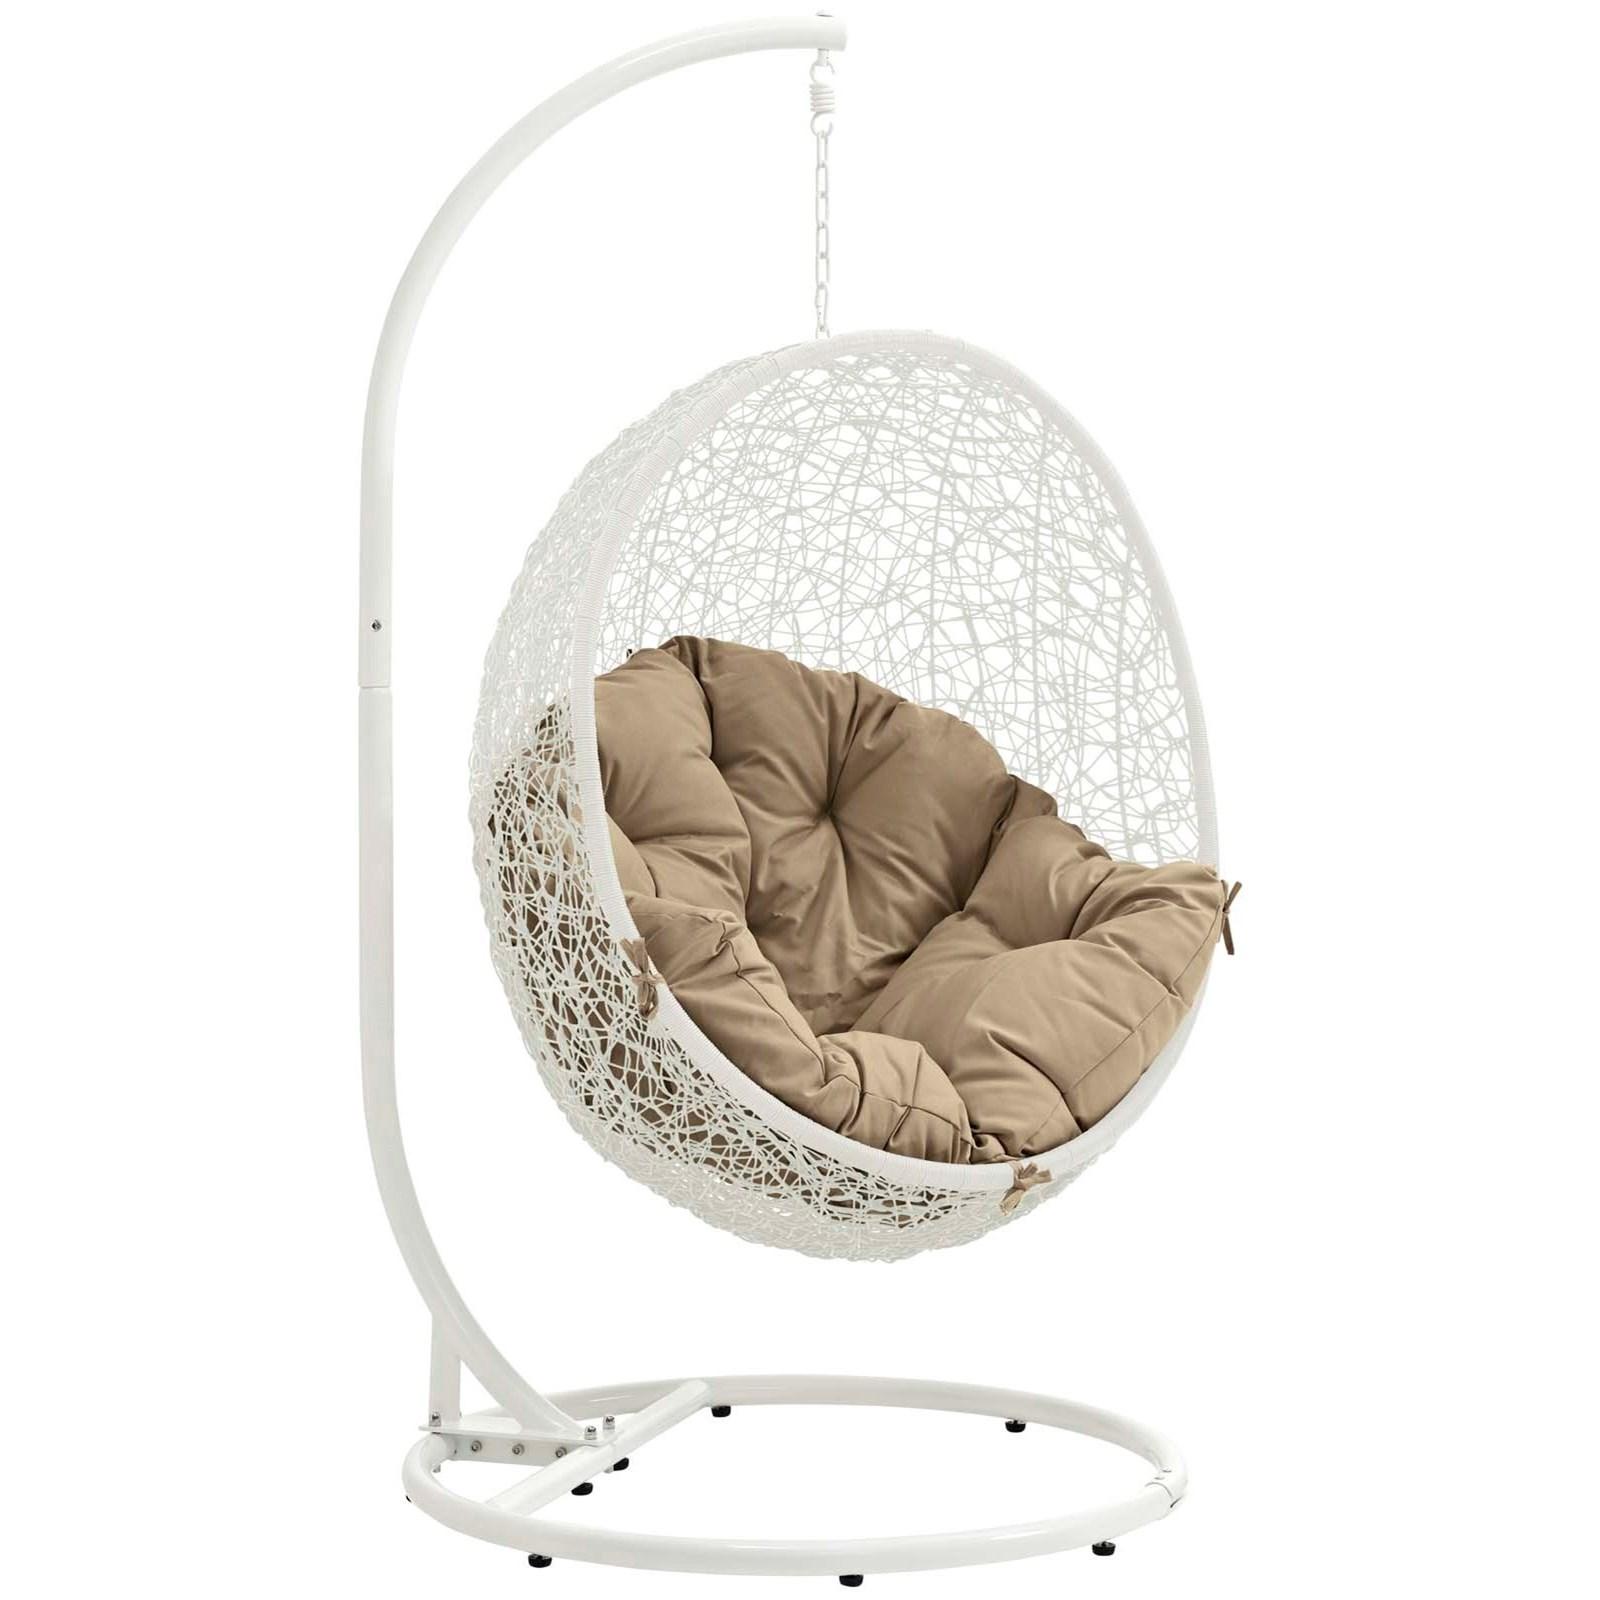 Patio Swing Chair